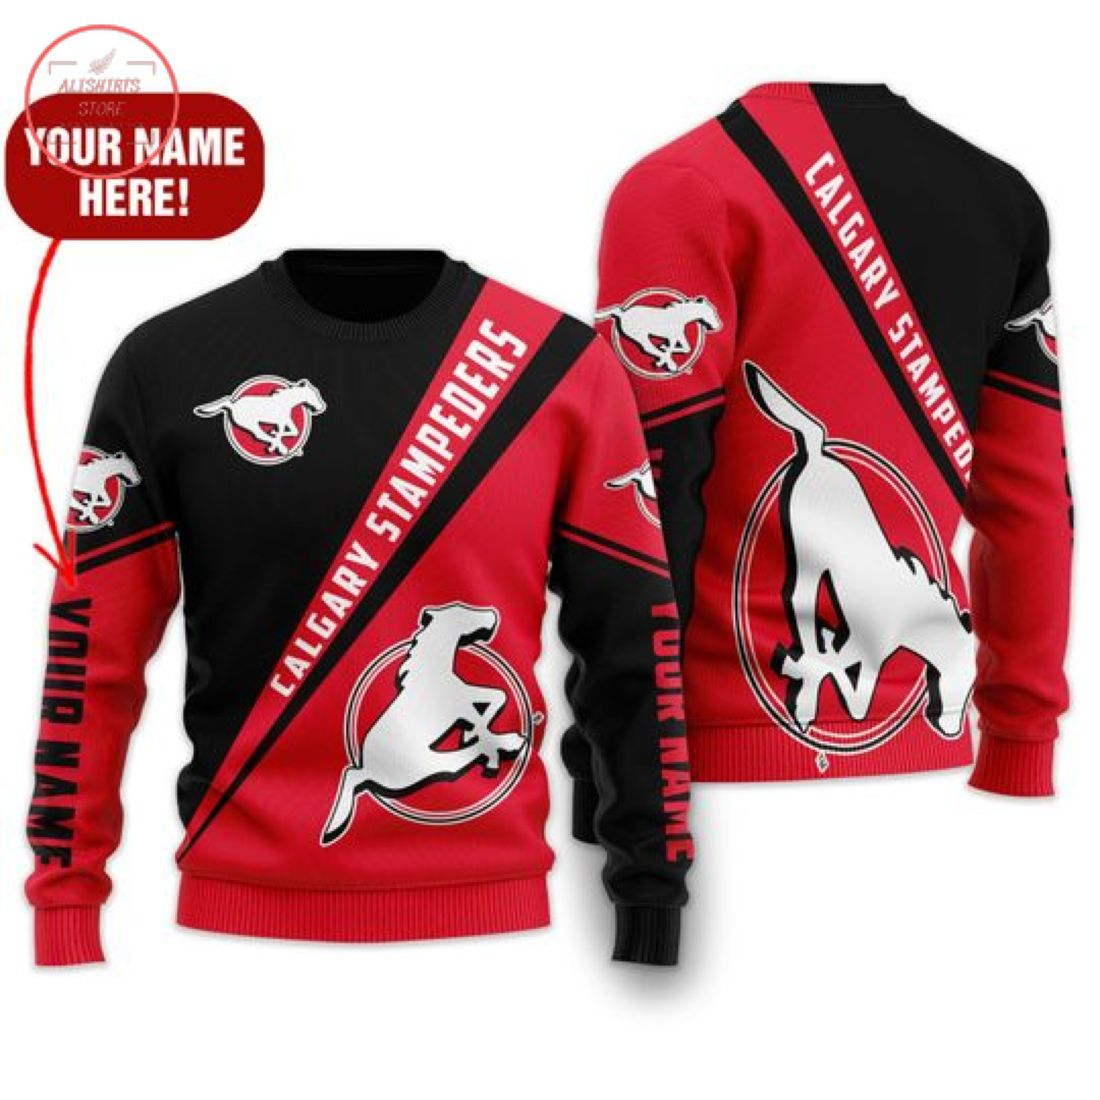 Cfl Calgary Stampeders Shirts